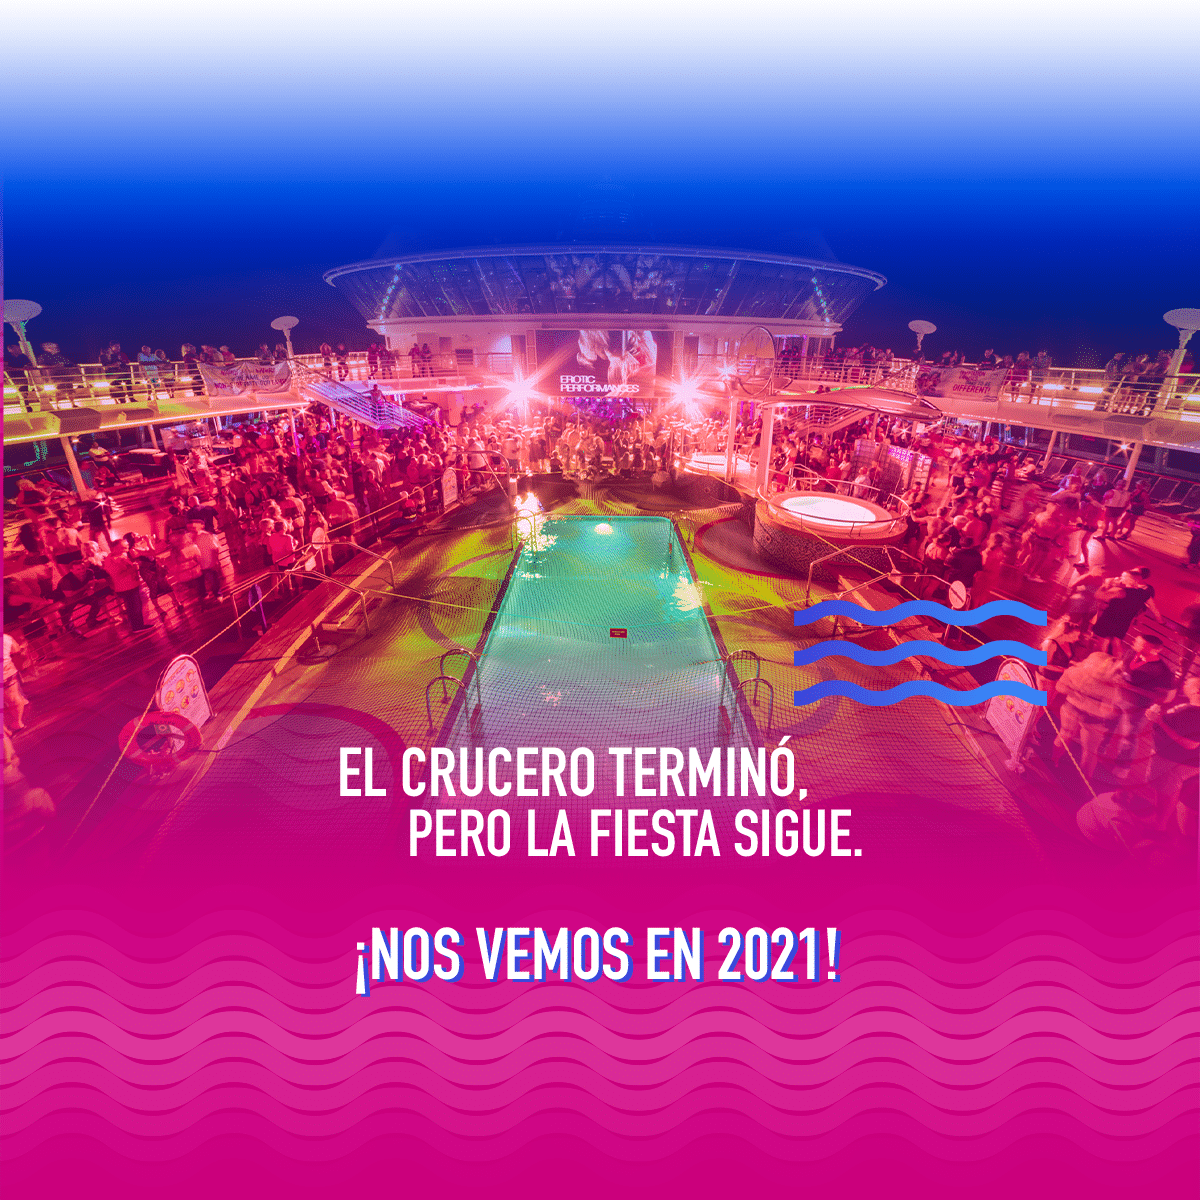 Temptation Caribbean Cruise 2020 | Temptation Experience